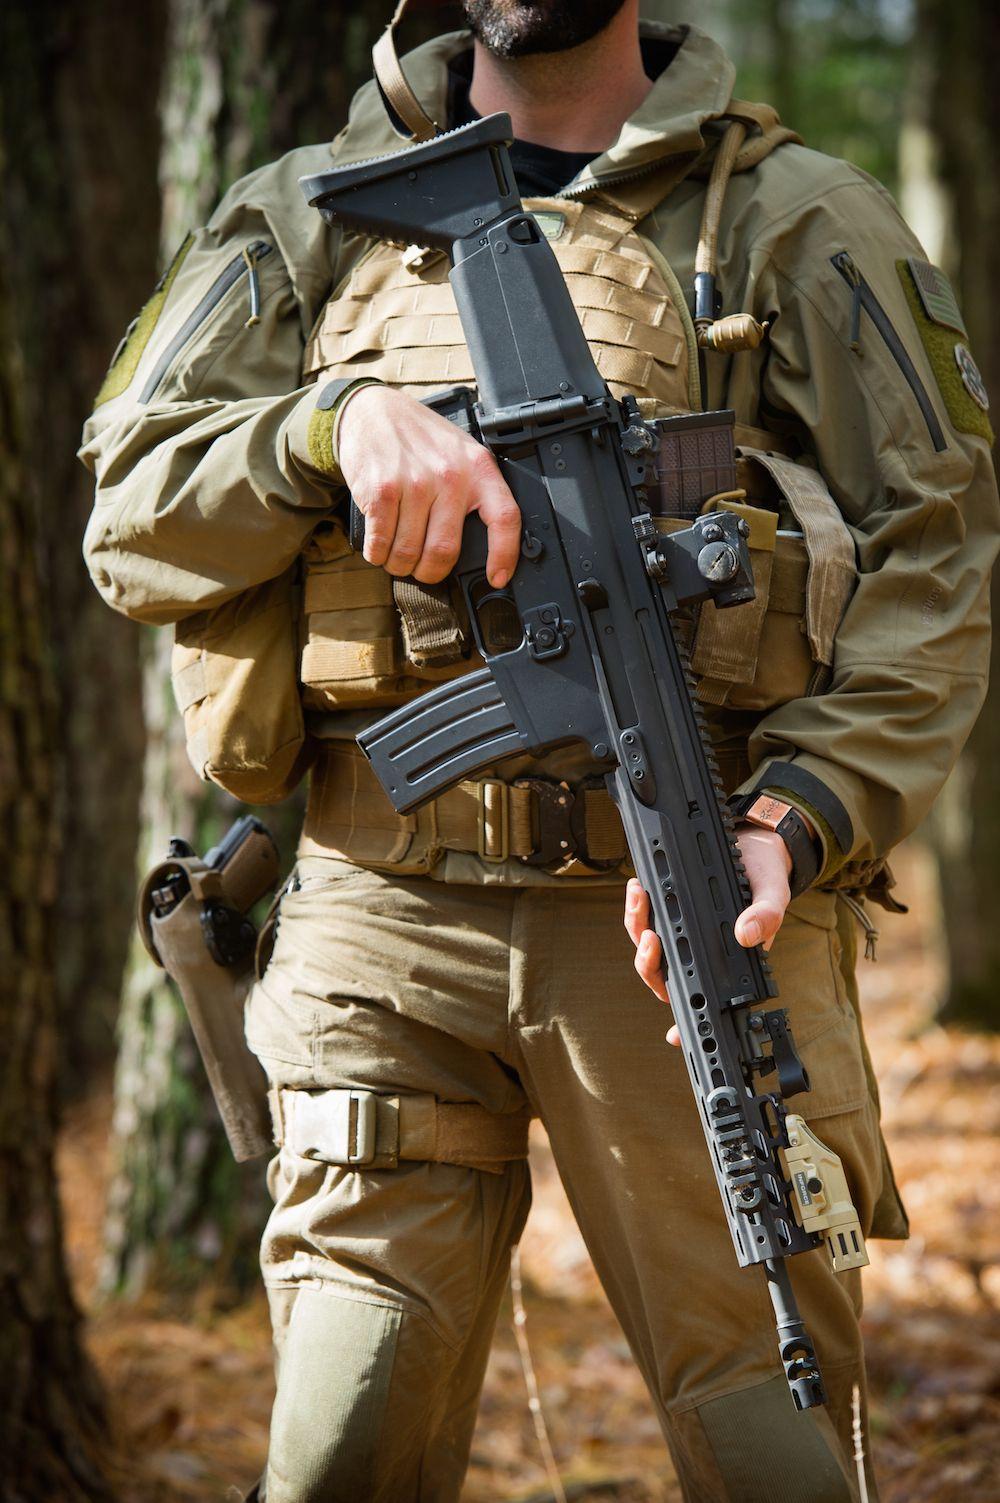 scar 17 KDG MREX MLOK Rail - Google Search | Guns | Guns, Ar